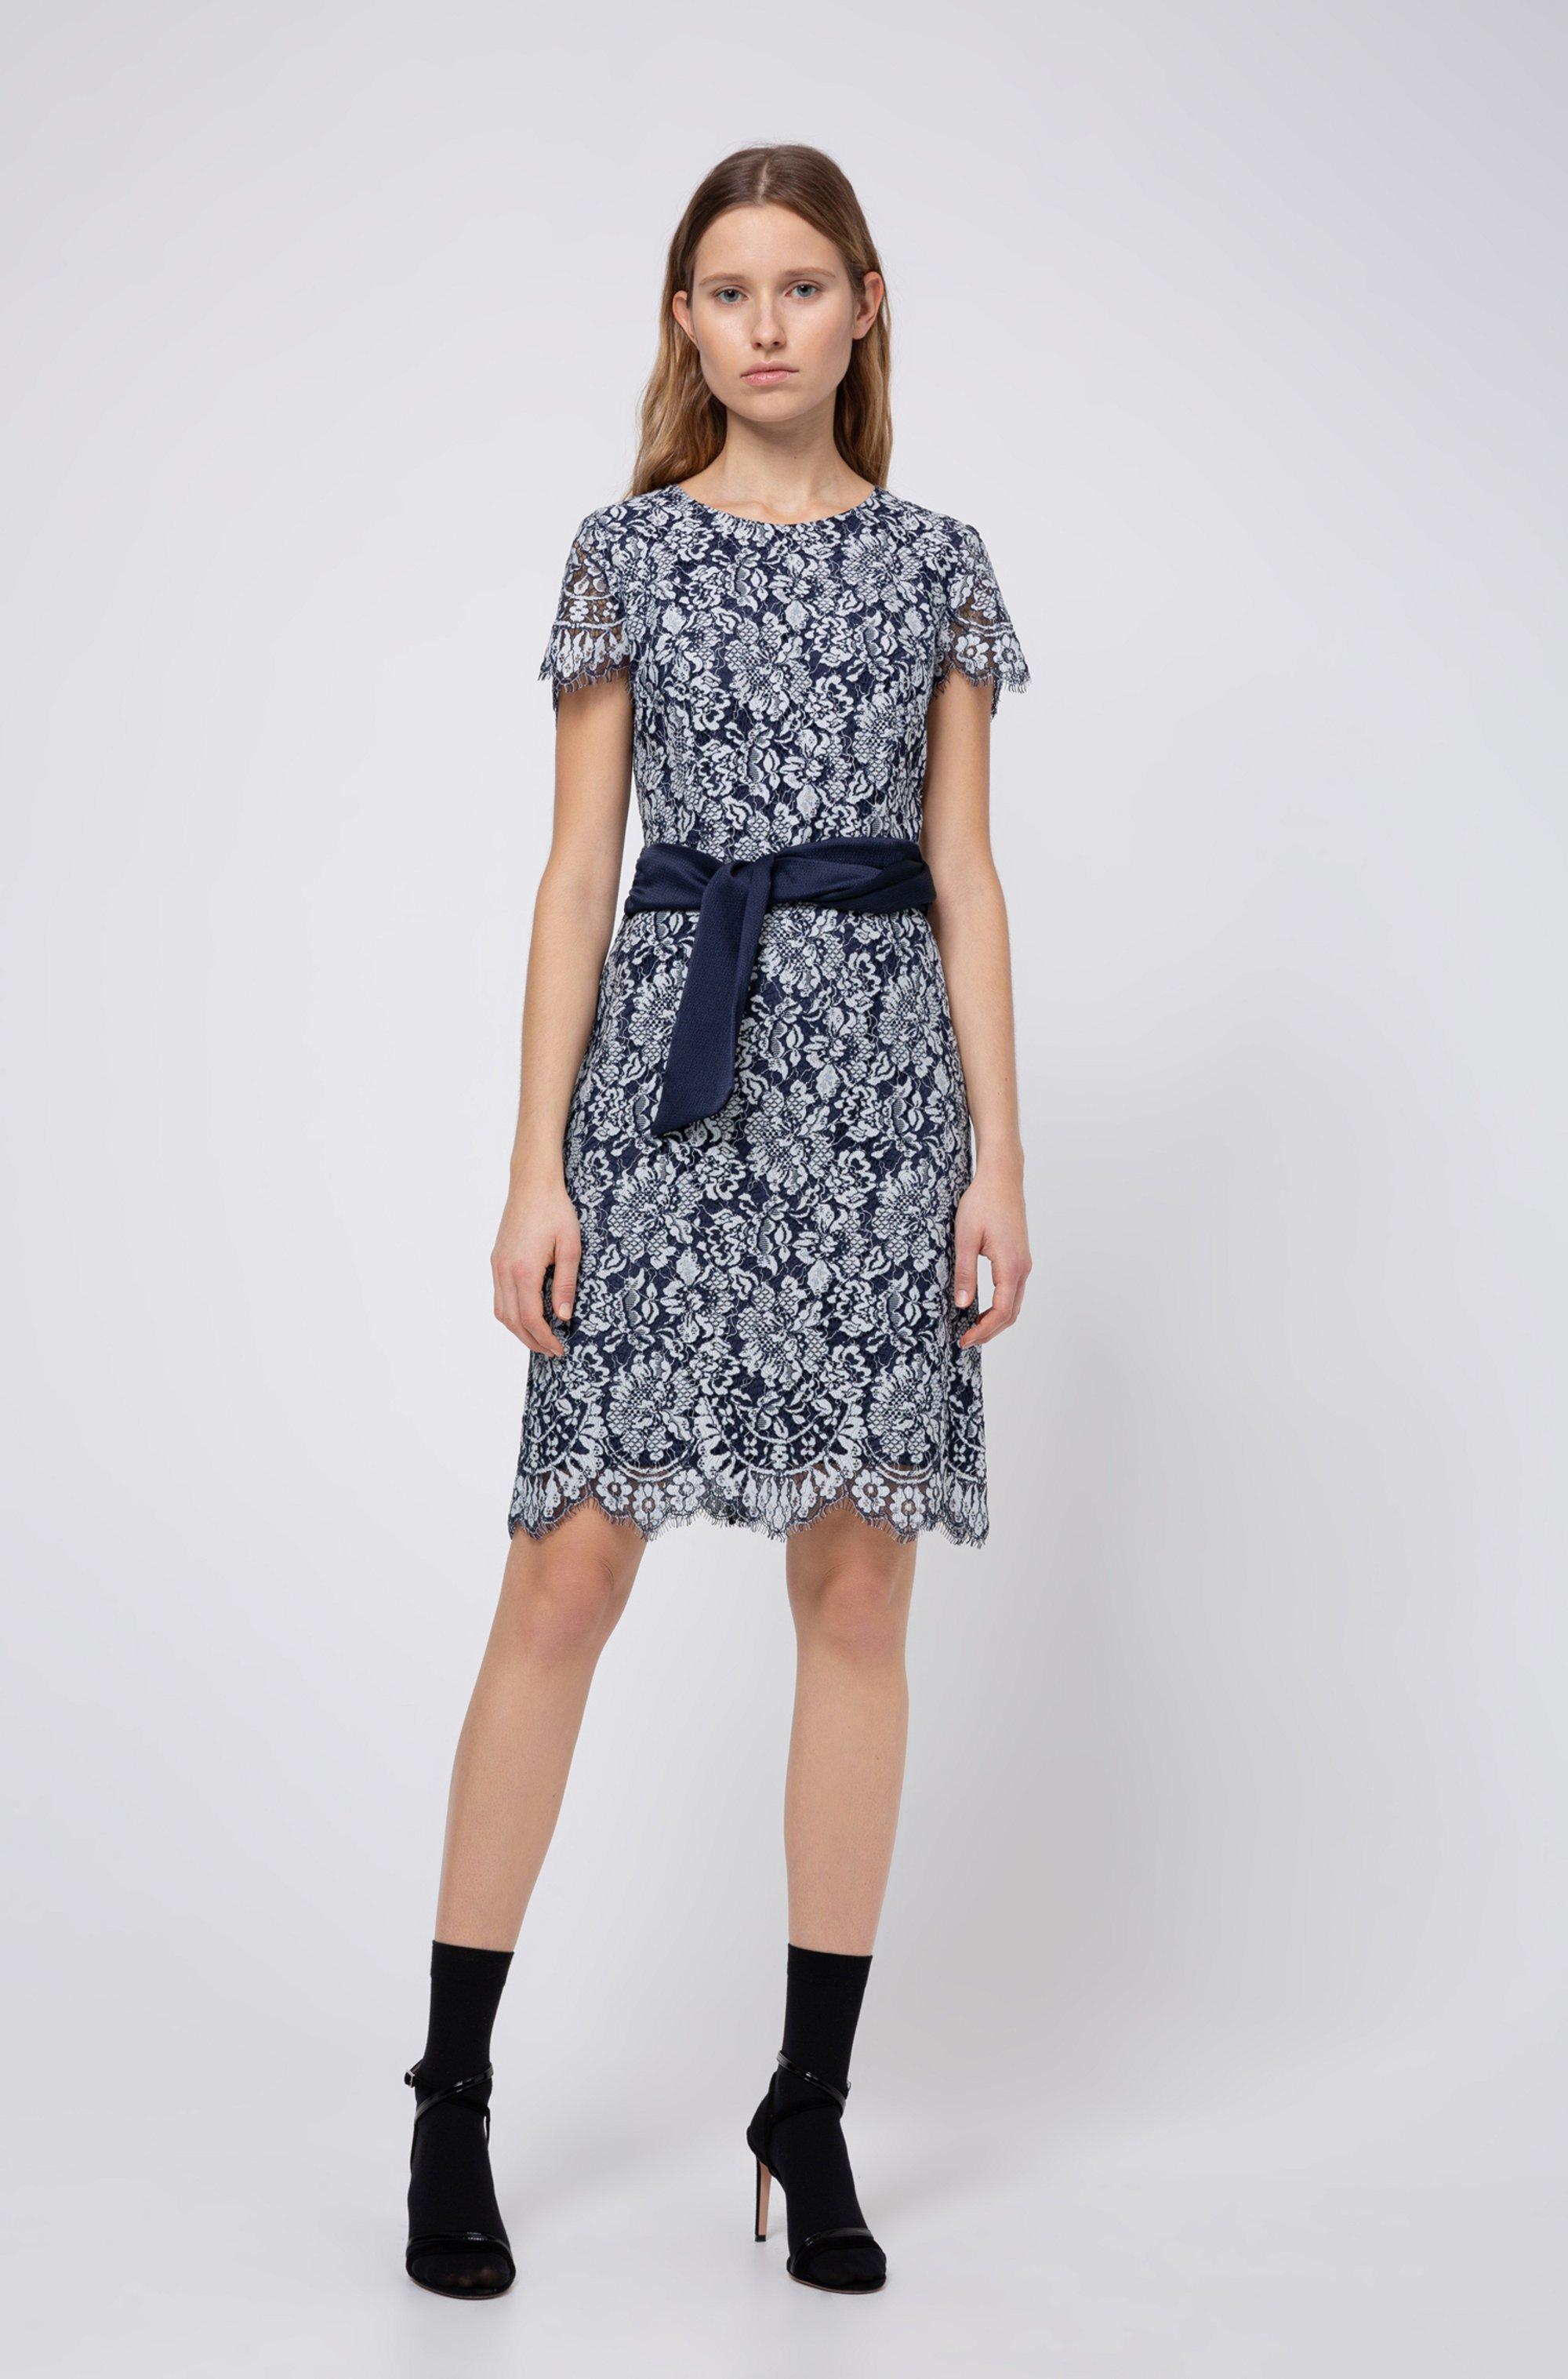 Scoop-neck lace dress with shiny belt